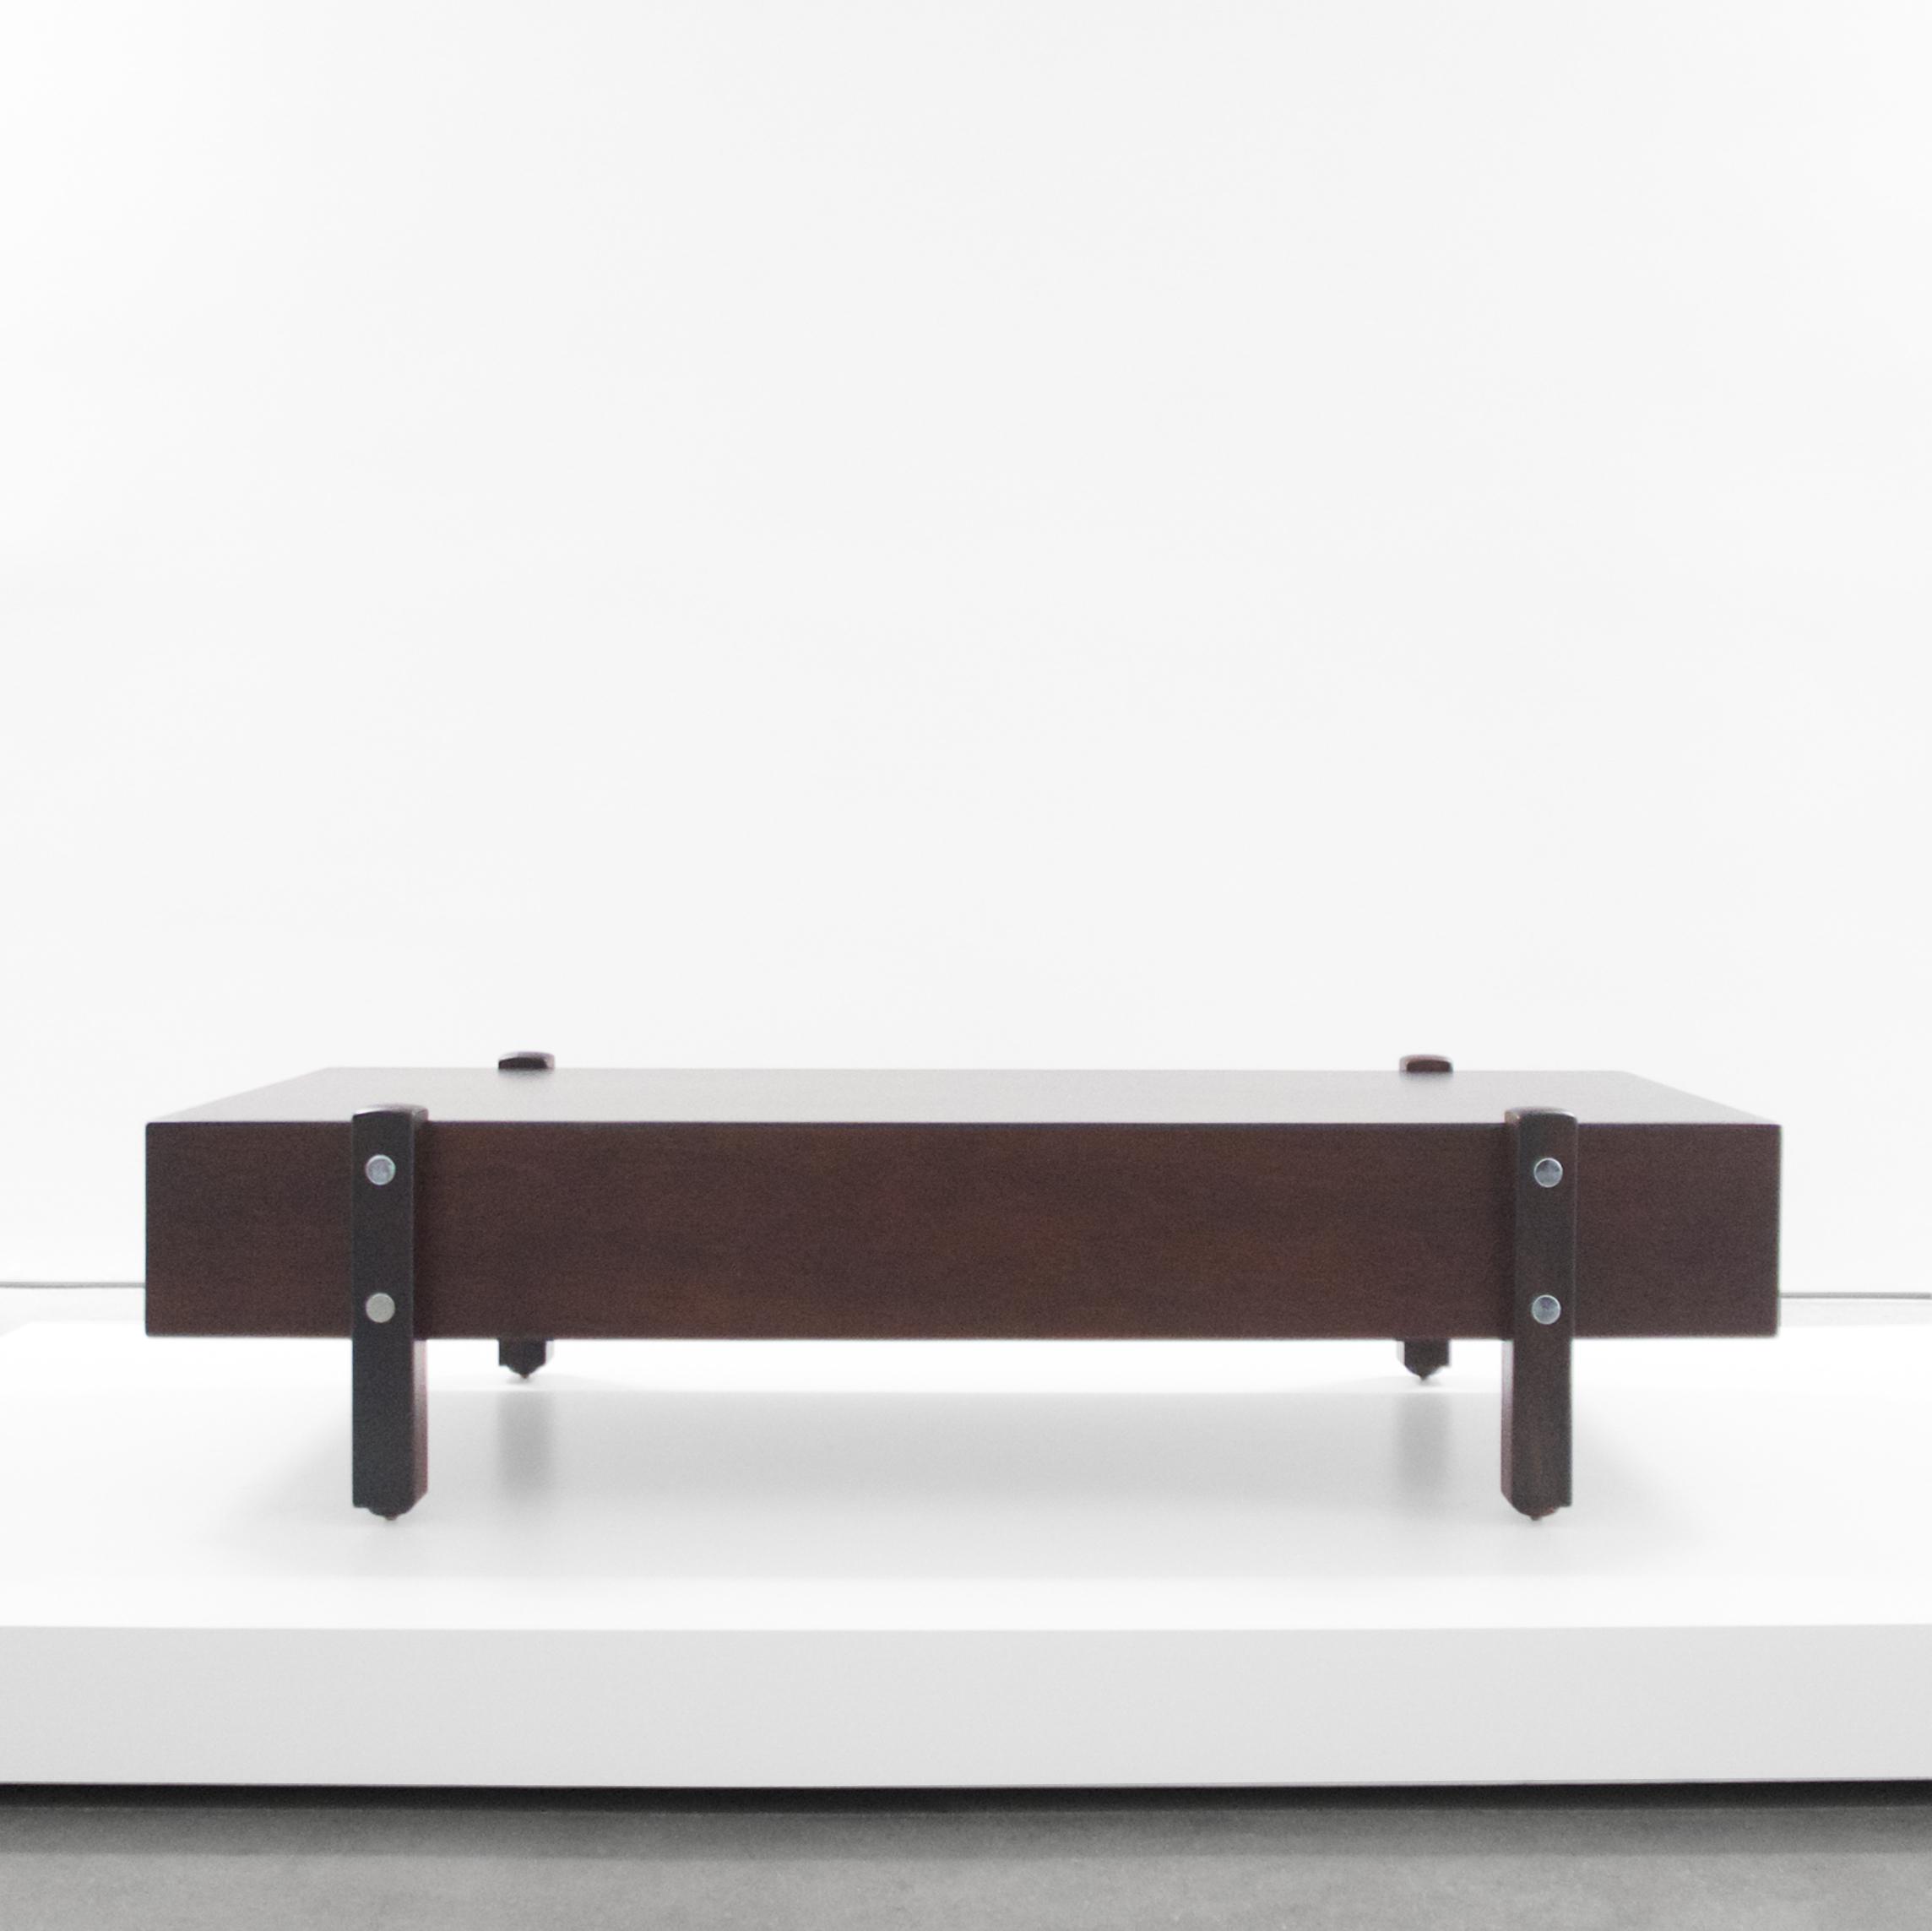 sergio rodrigues  eleh bench for aros  c. 1965 ...